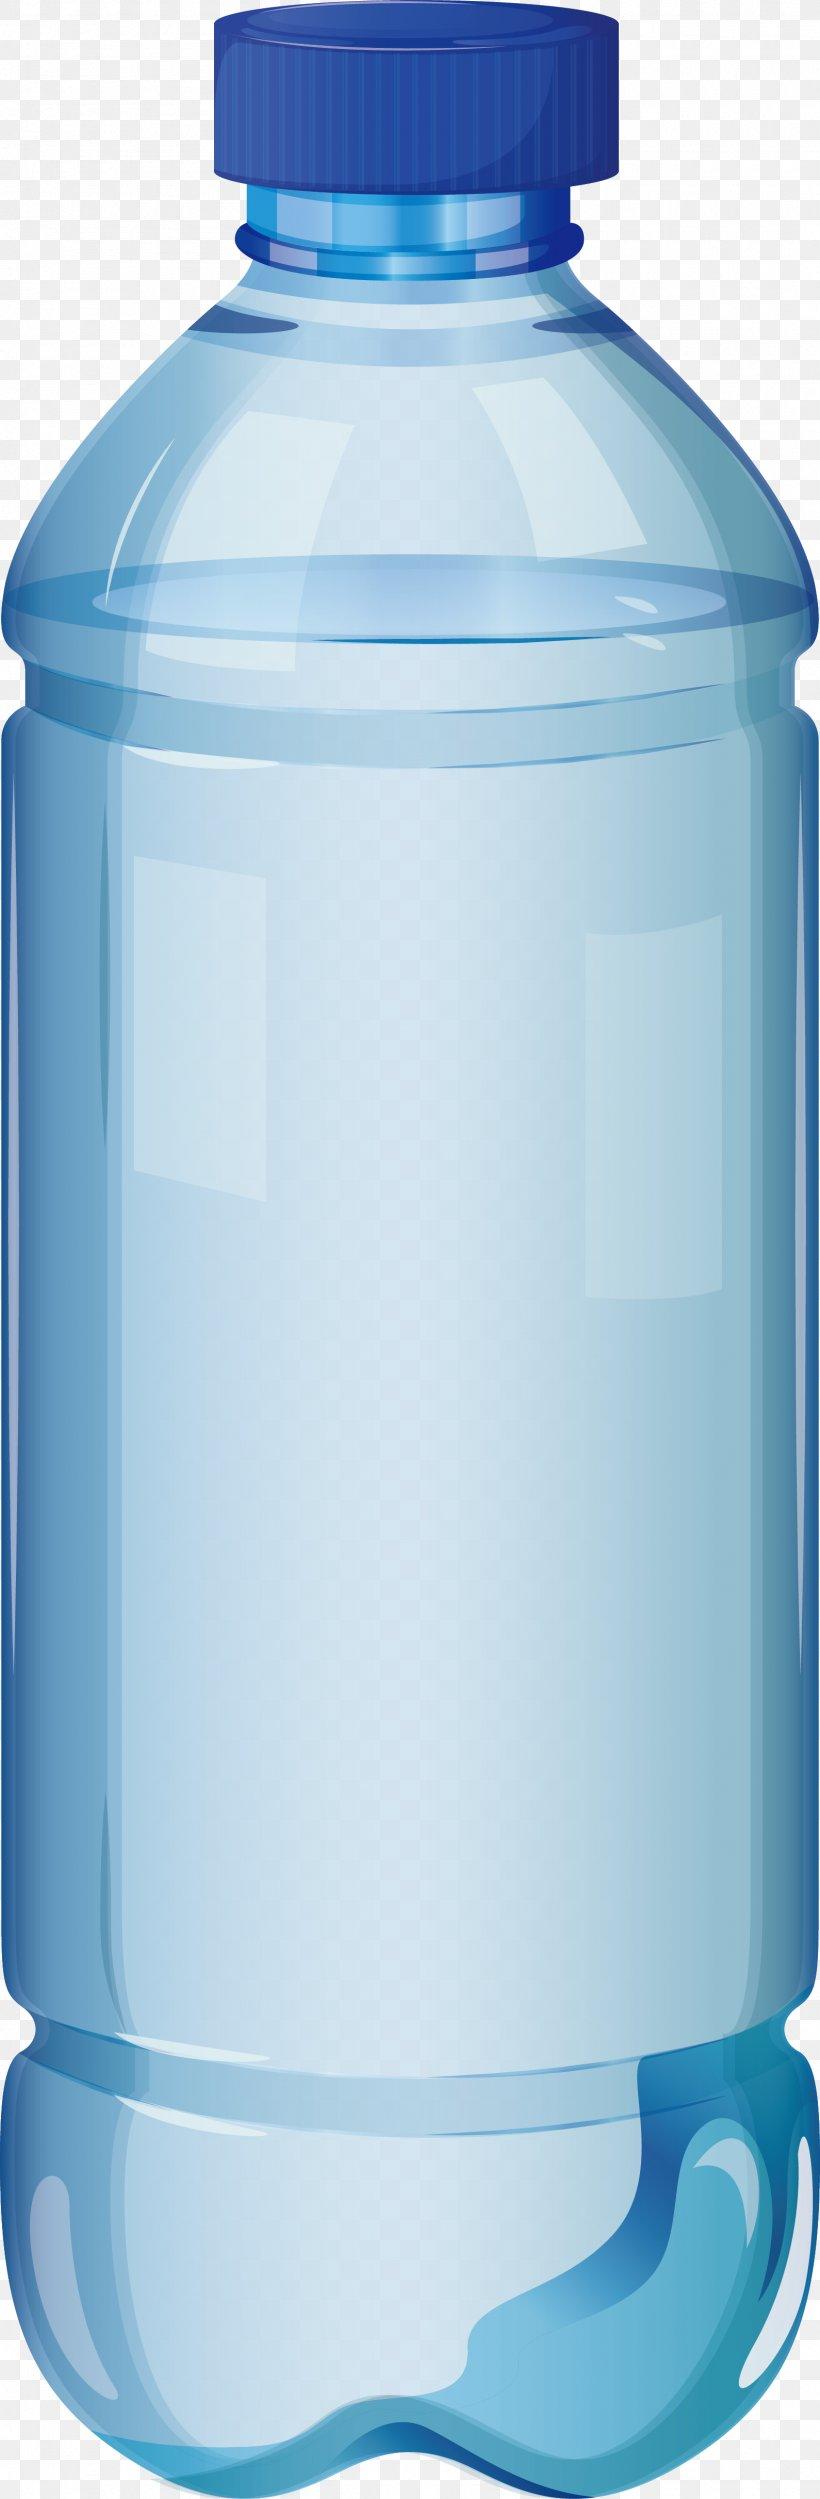 Water Bottle Clip Art, PNG, 1590x4846px, Bottled Water, Bottle, Cylinder, Distilled Water, Drink Download Free